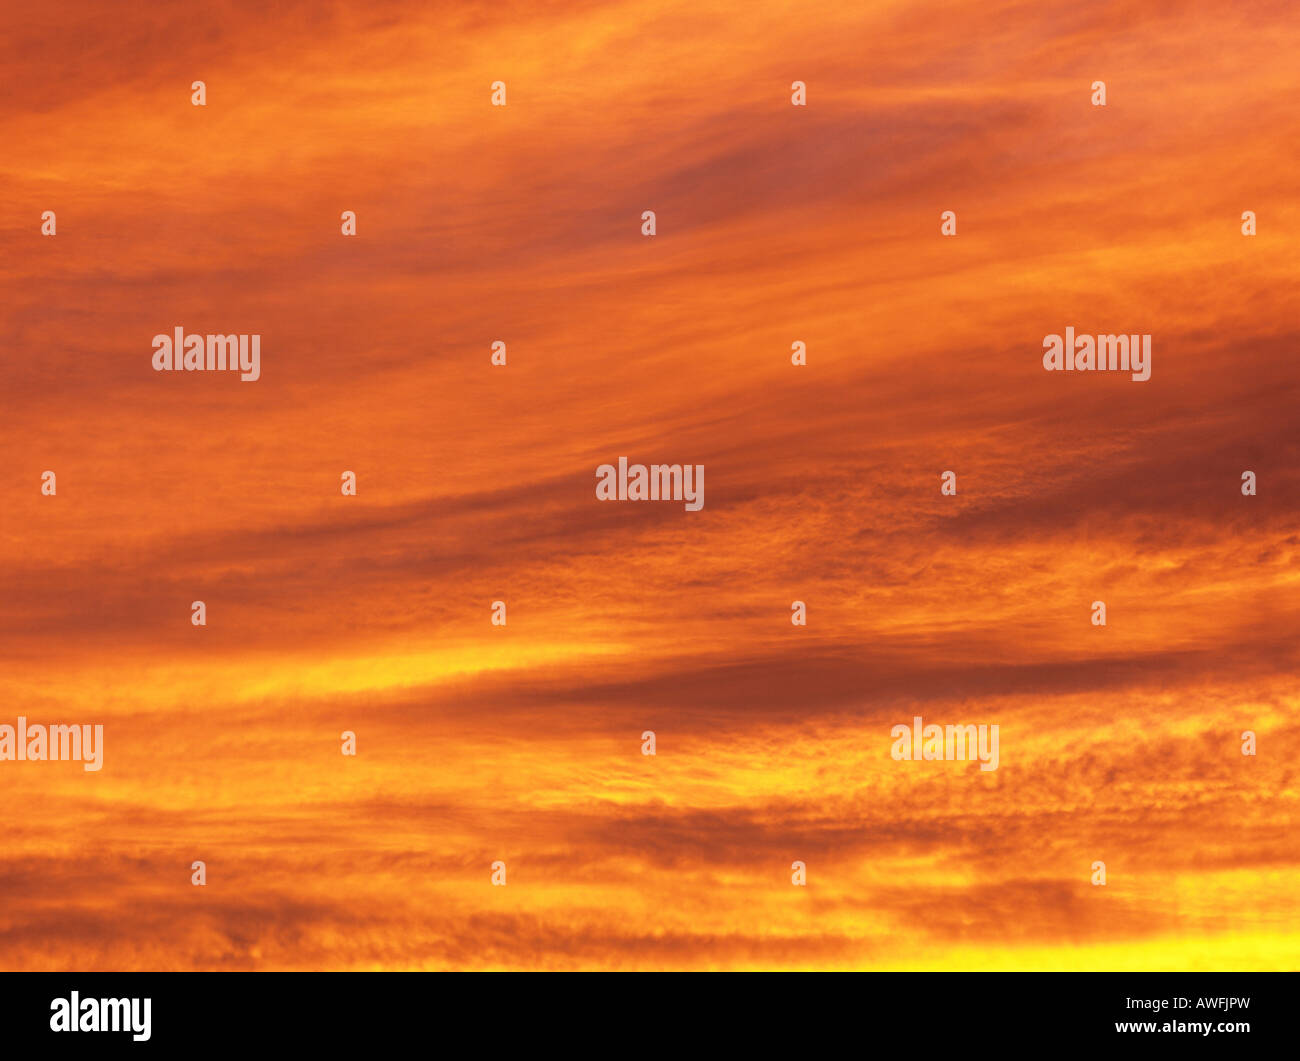 'Twilight of the Gods': evening sky set on fire - Stock Image